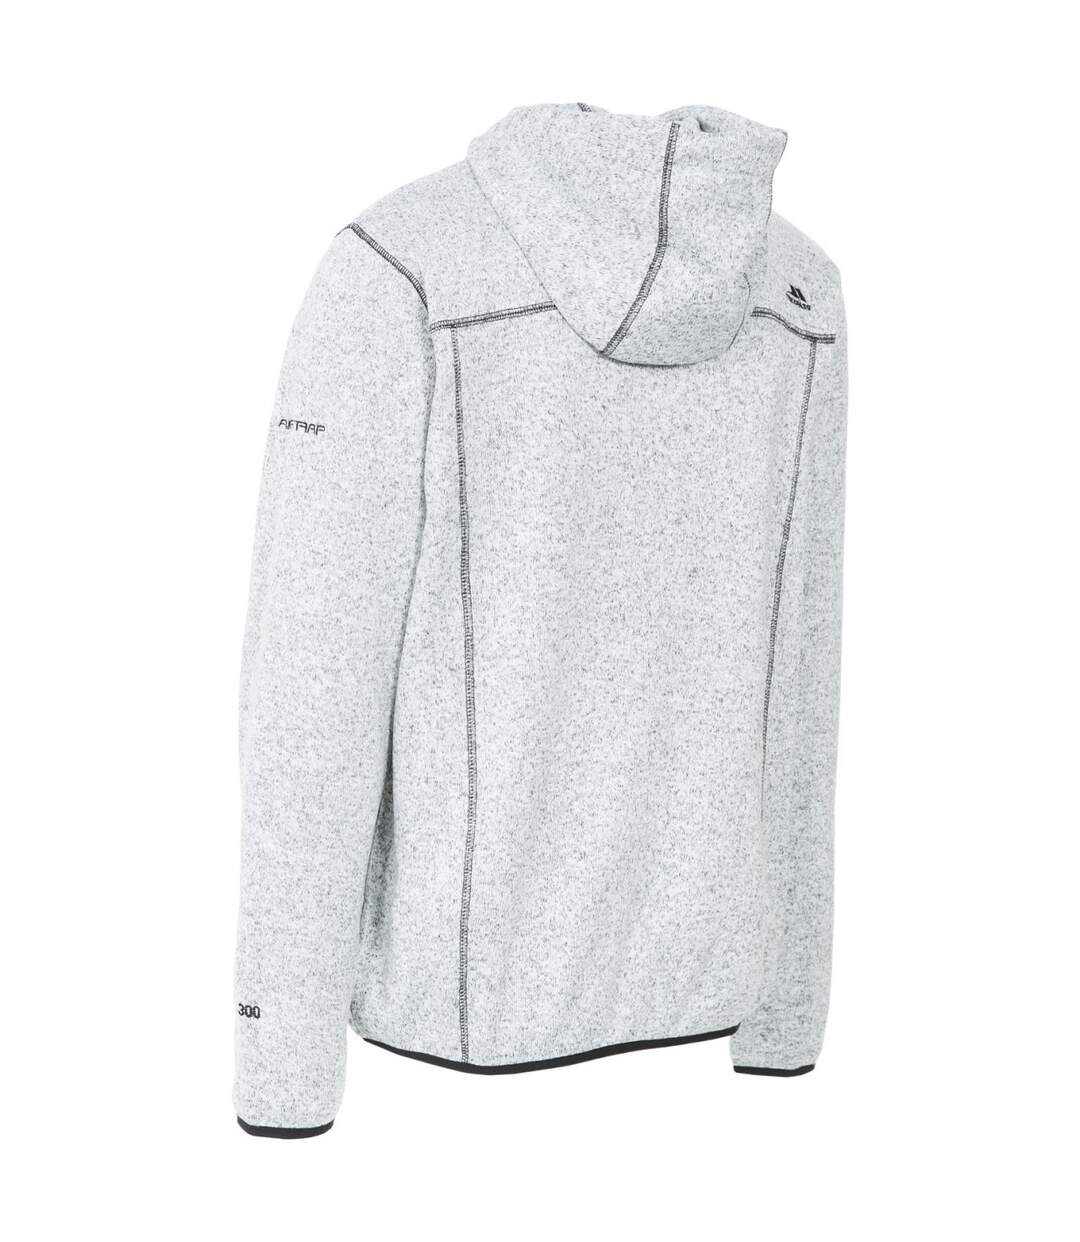 Trespass Mens Odeno Fleece Jacket (Cool Grey Marl) - UTTP4374